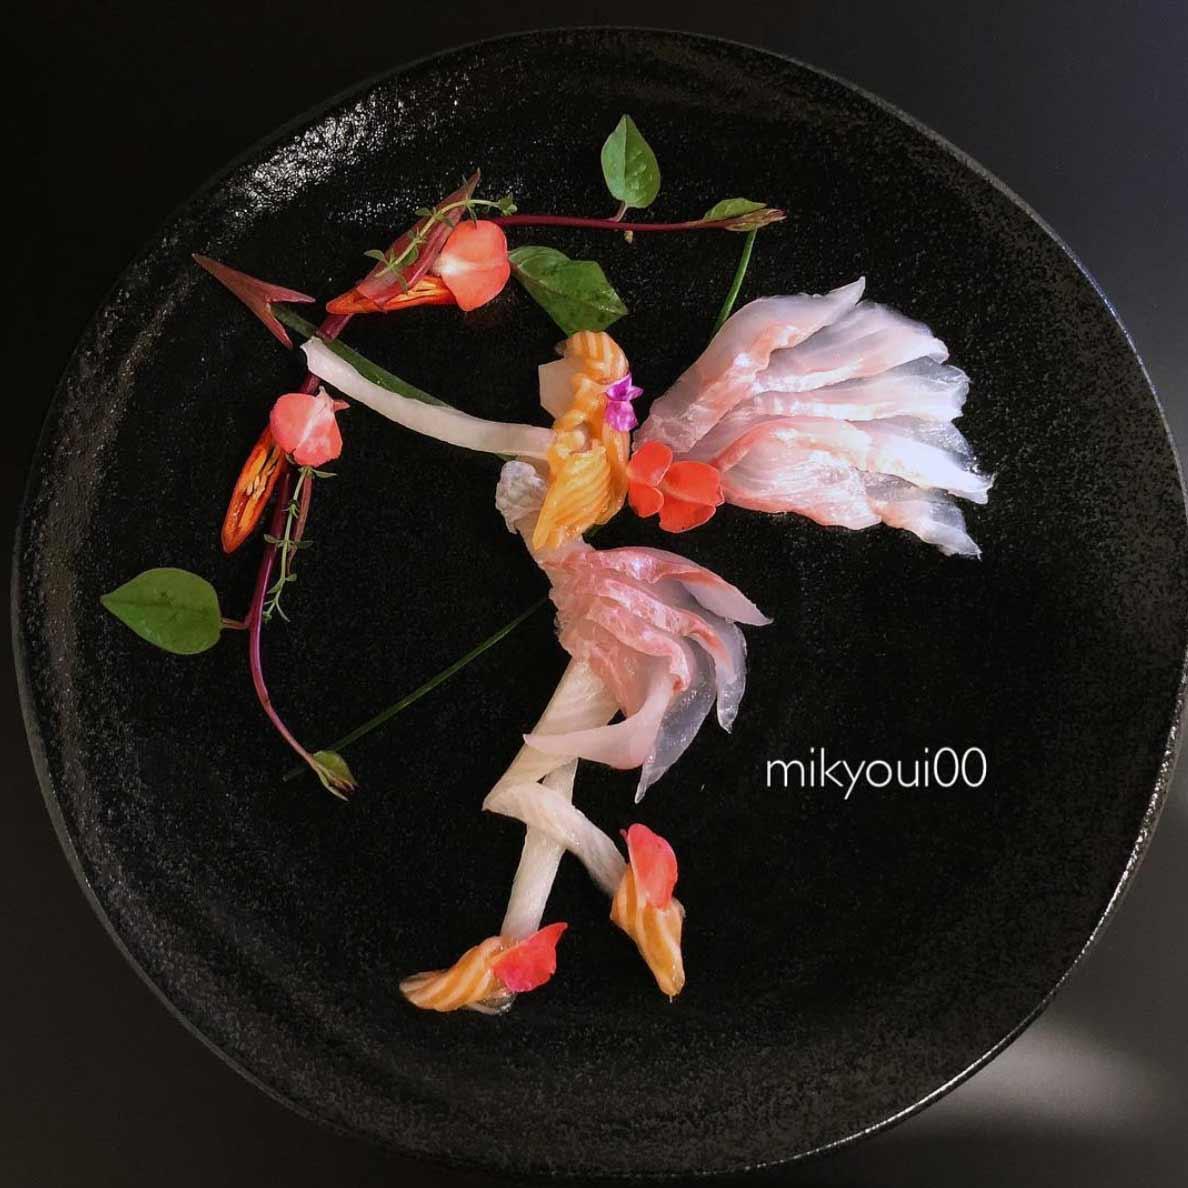 Wundervolle Sashimi-Kunstwerke von mikyou mikyou-sashimi-art-sushi-fischbilder_03